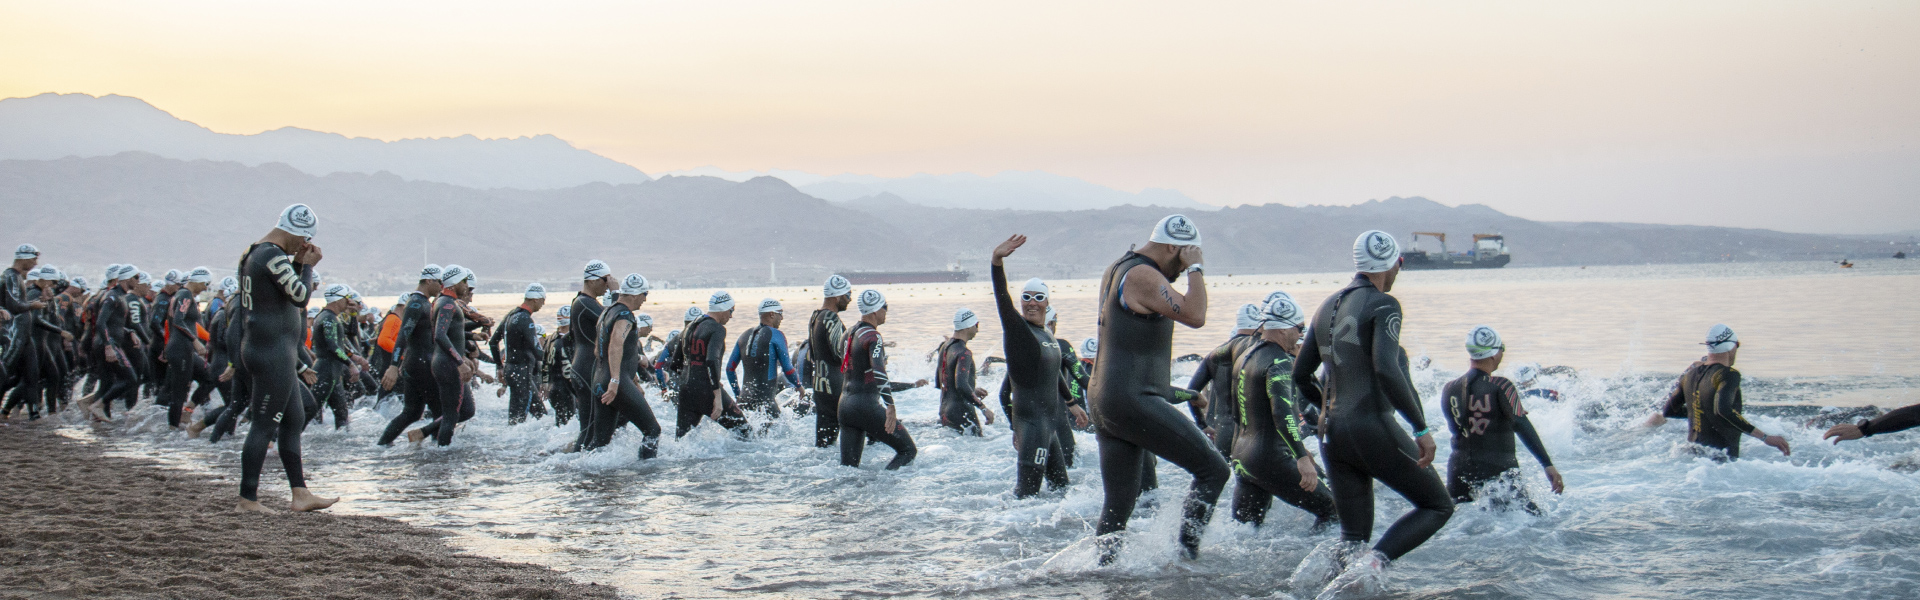 Zoggs Swim Diaries: Day 3 of the Sport Relief #TeamBetter 31 Mile Swim Challenge